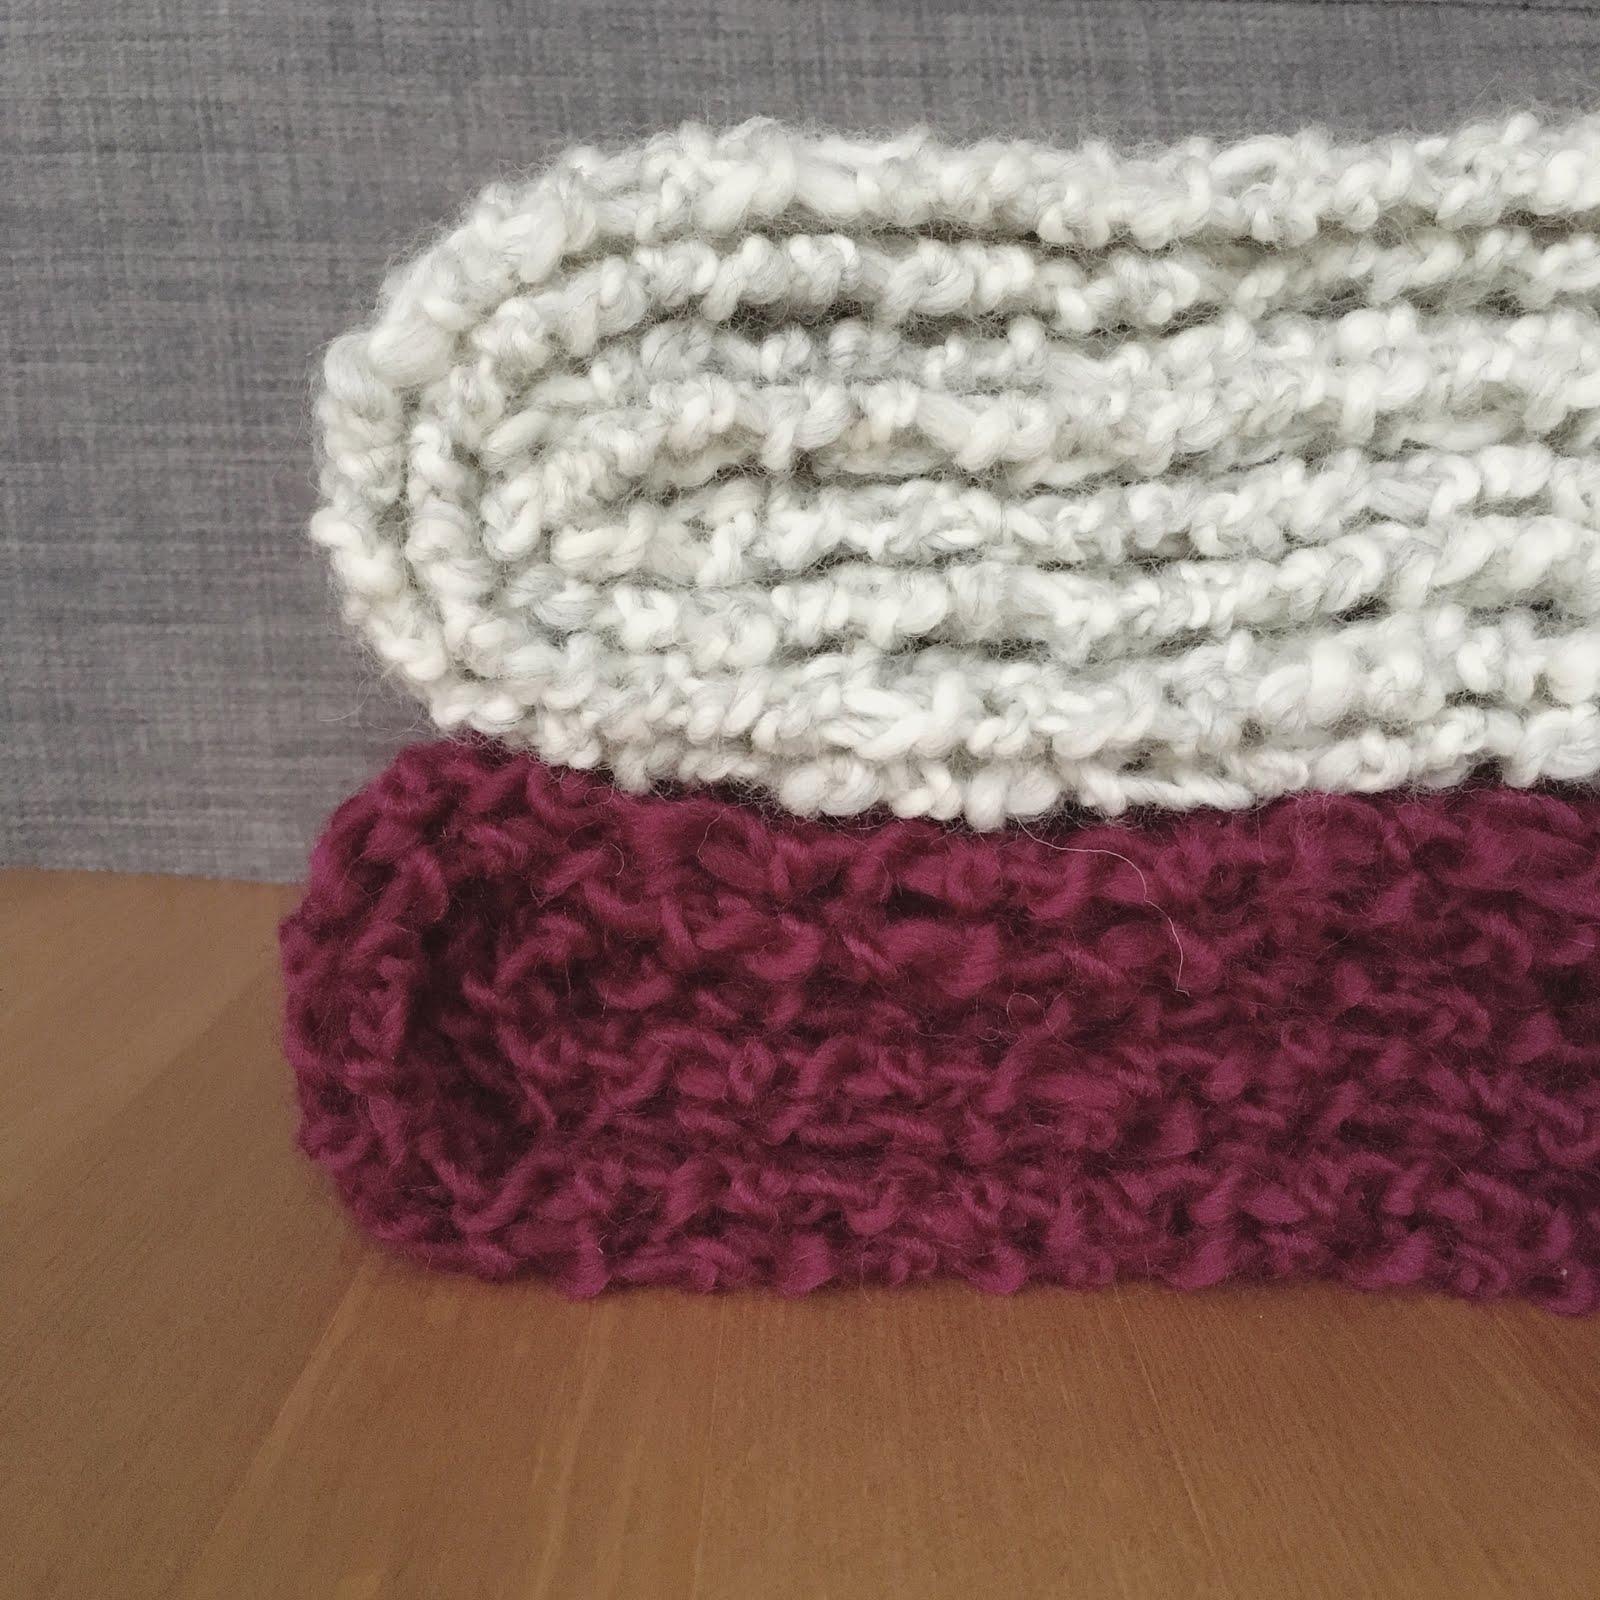 Oliphant Kat: Seed stitch scarf set